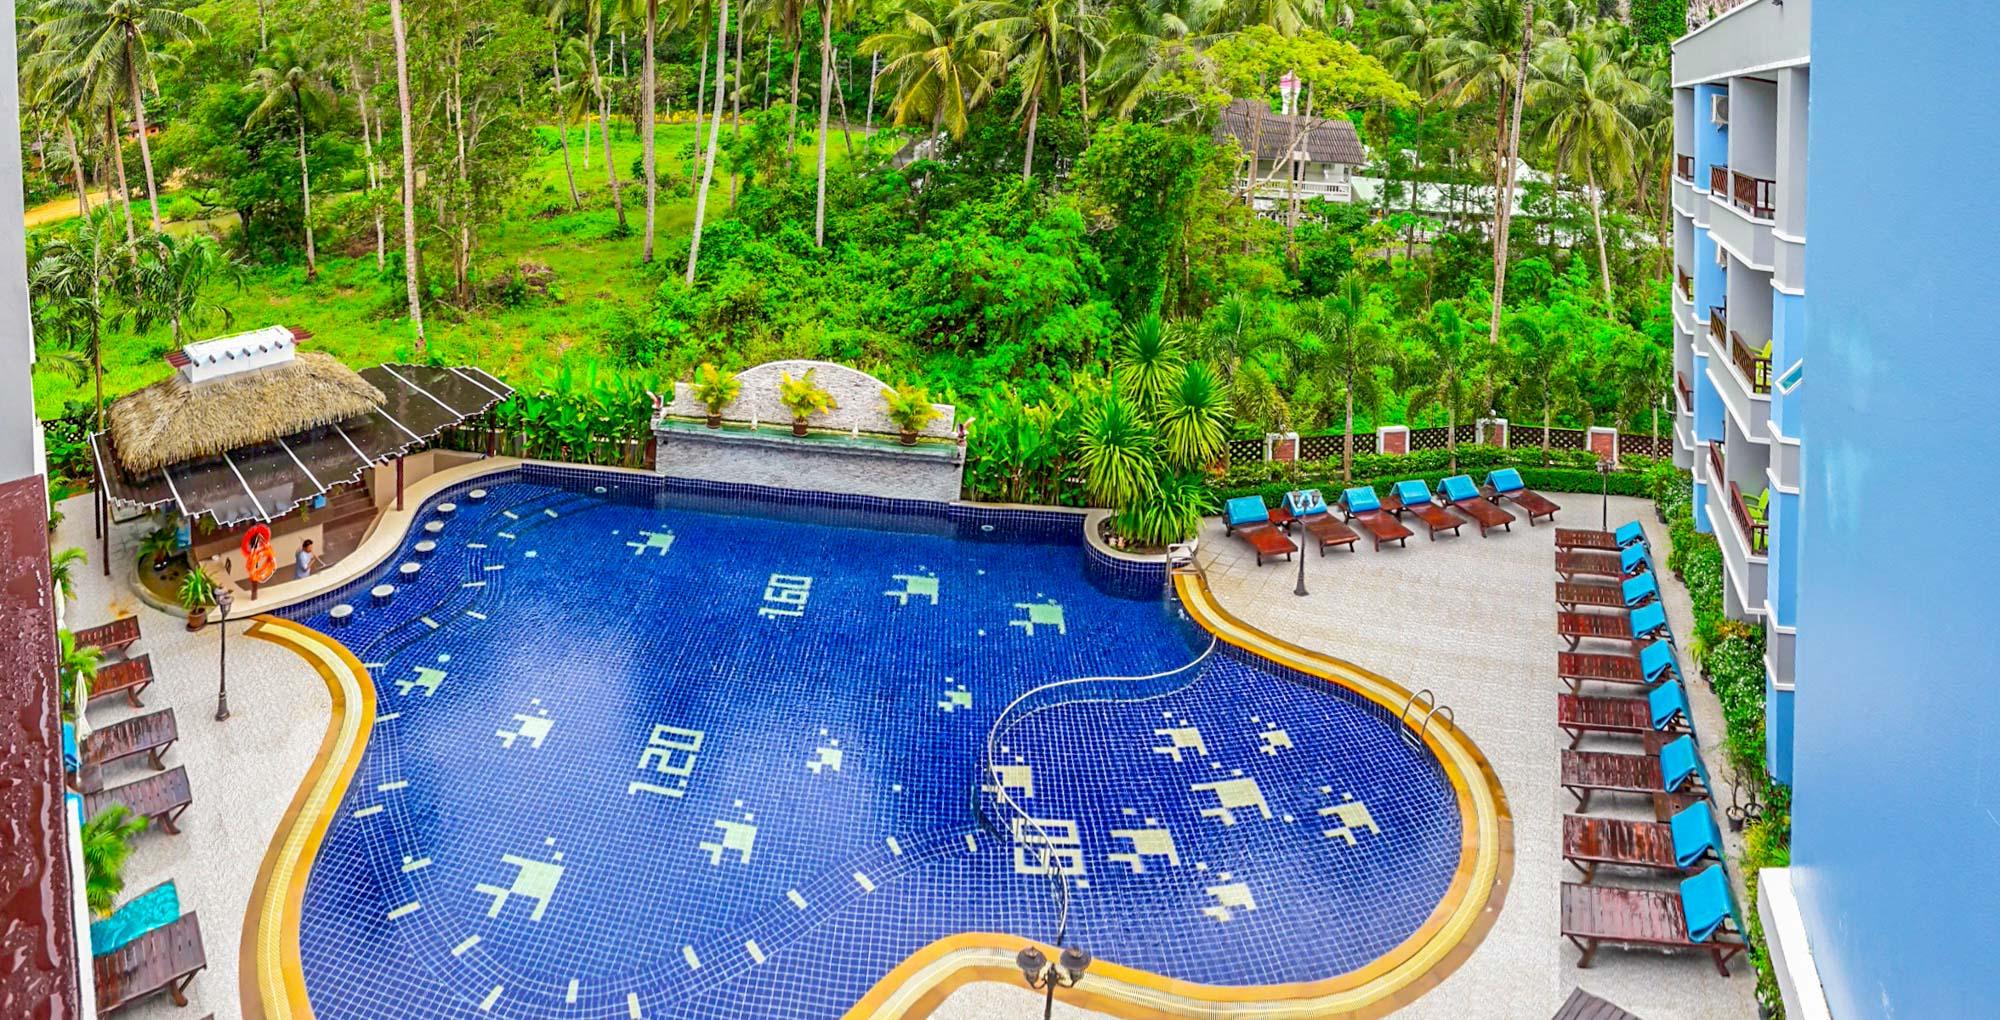 Aonang Silver Orchid Resort Halal Hotel Krabi  Aonang Silver Orchid Resort  อ่าวนาง ซิลเวอร์ ออคิด รีสอร์ท 20160919 155528